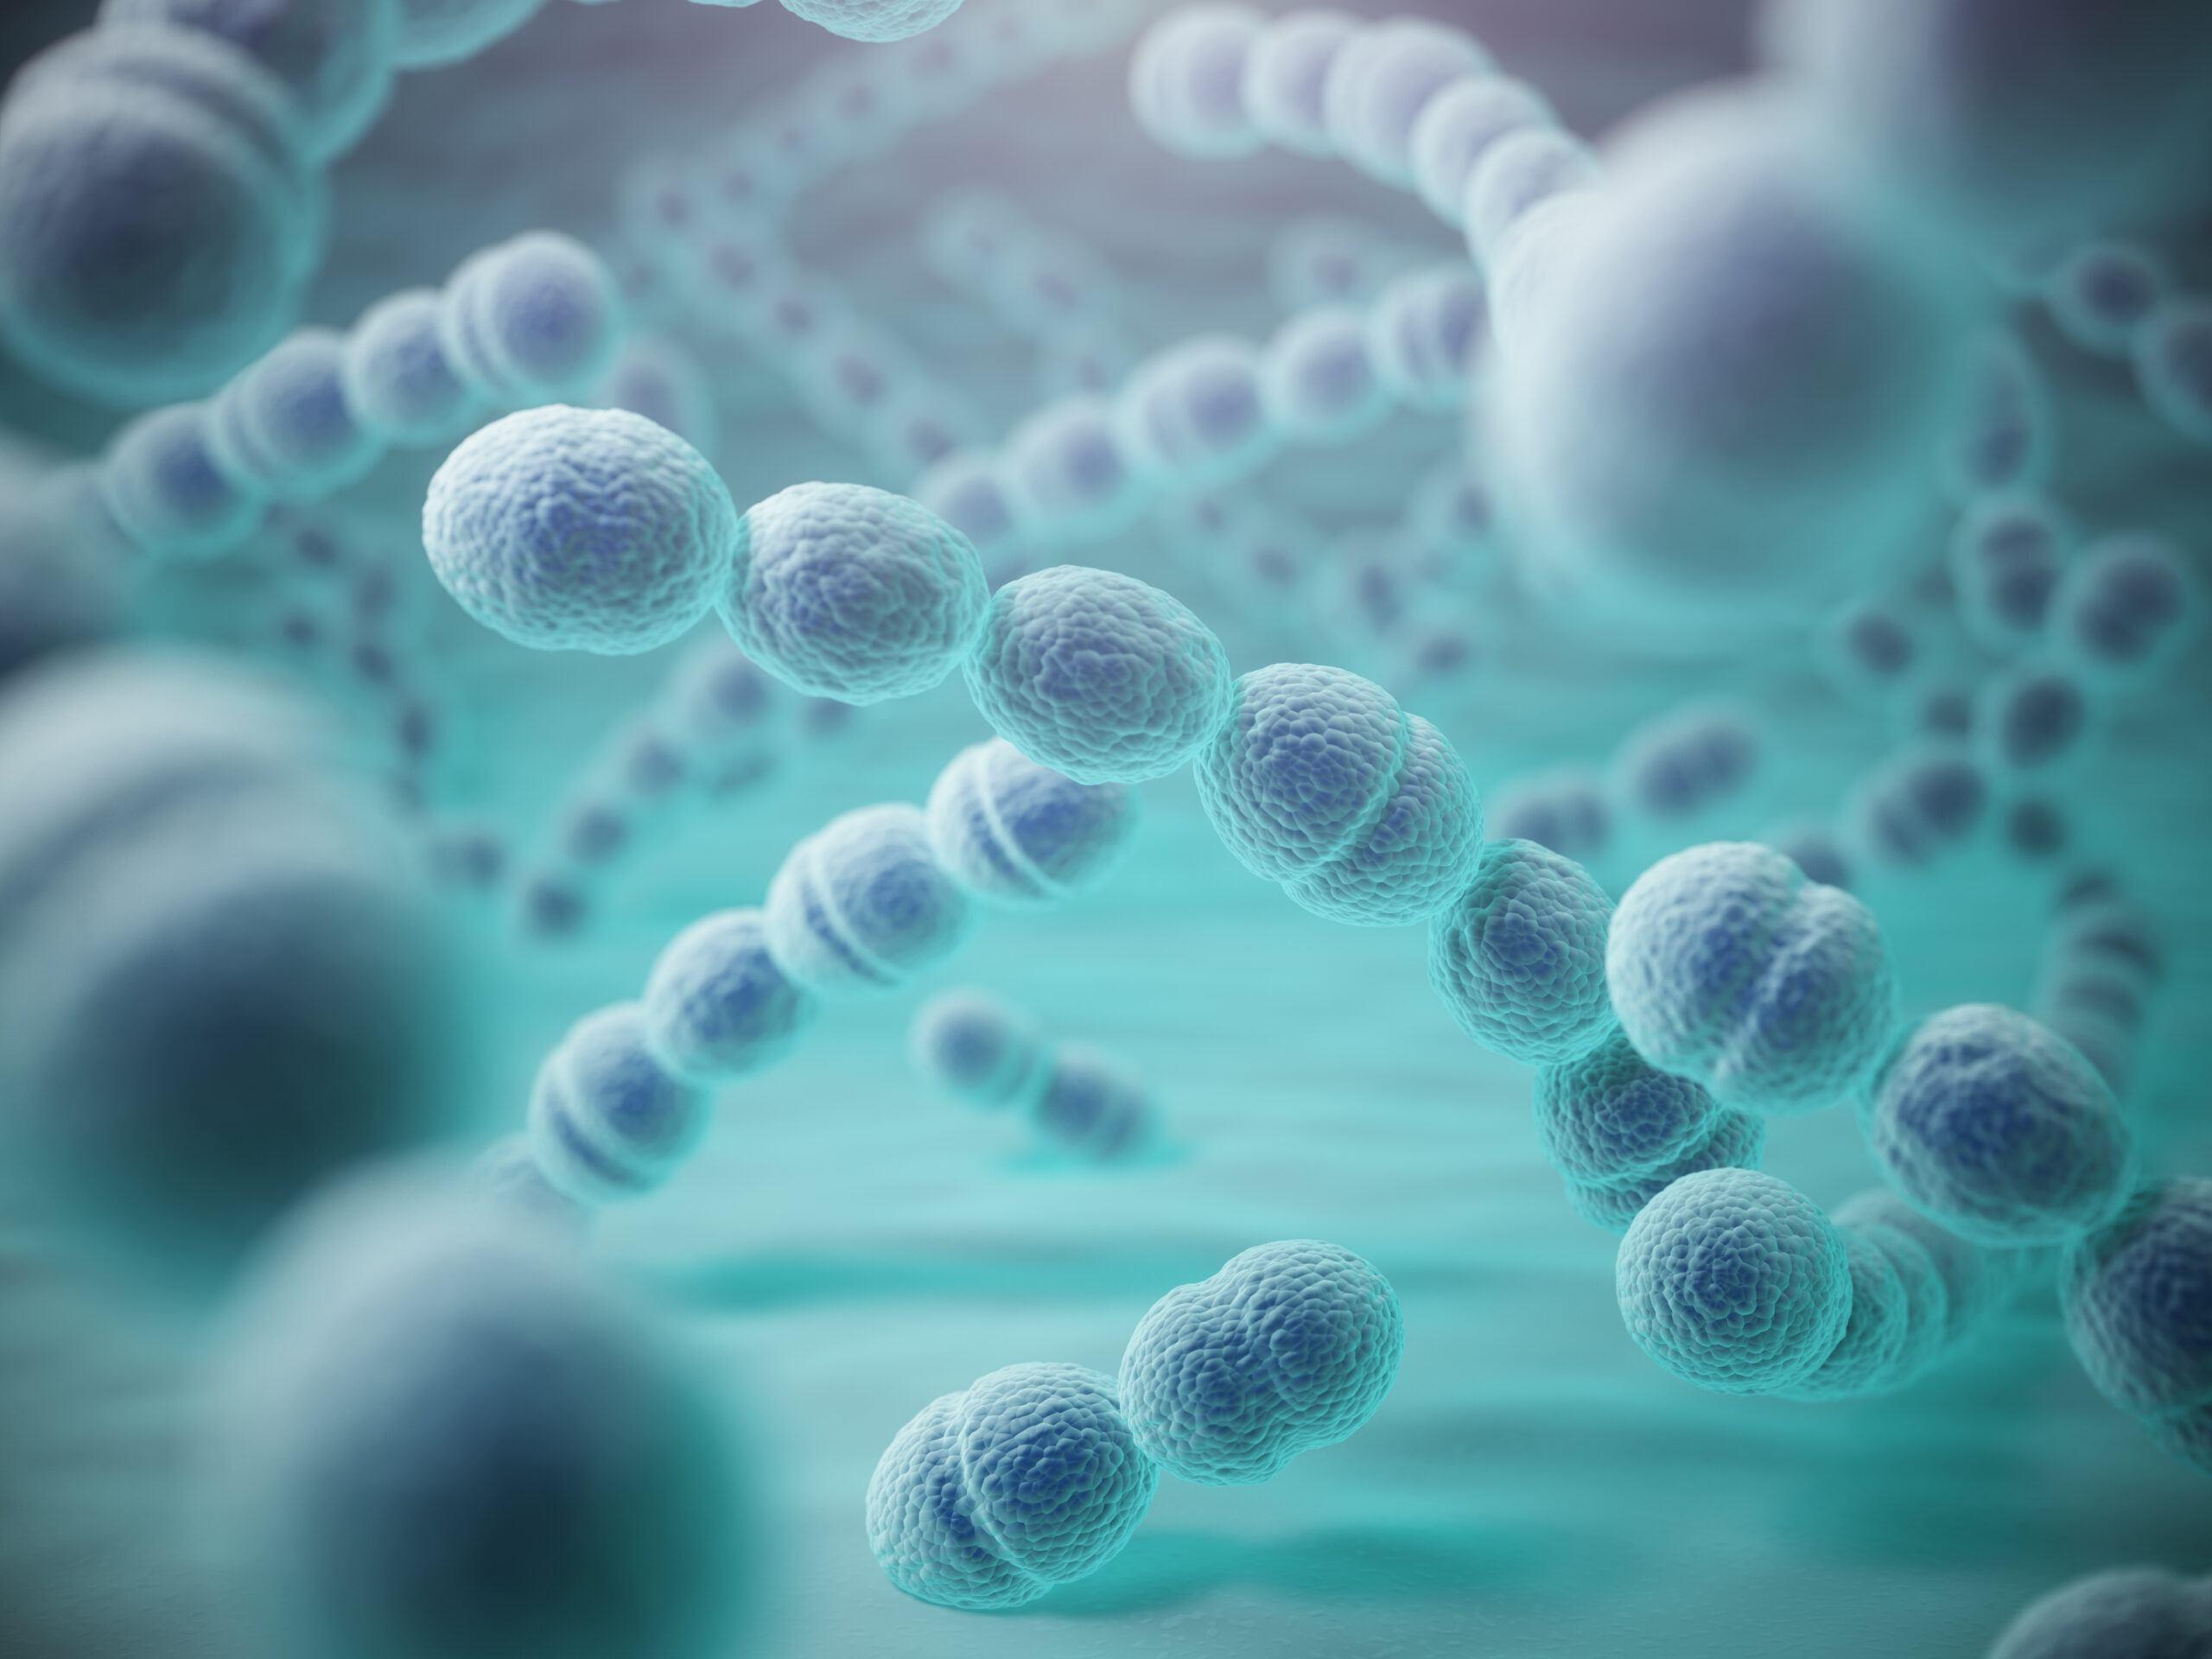 Streptococcus salivarius K12